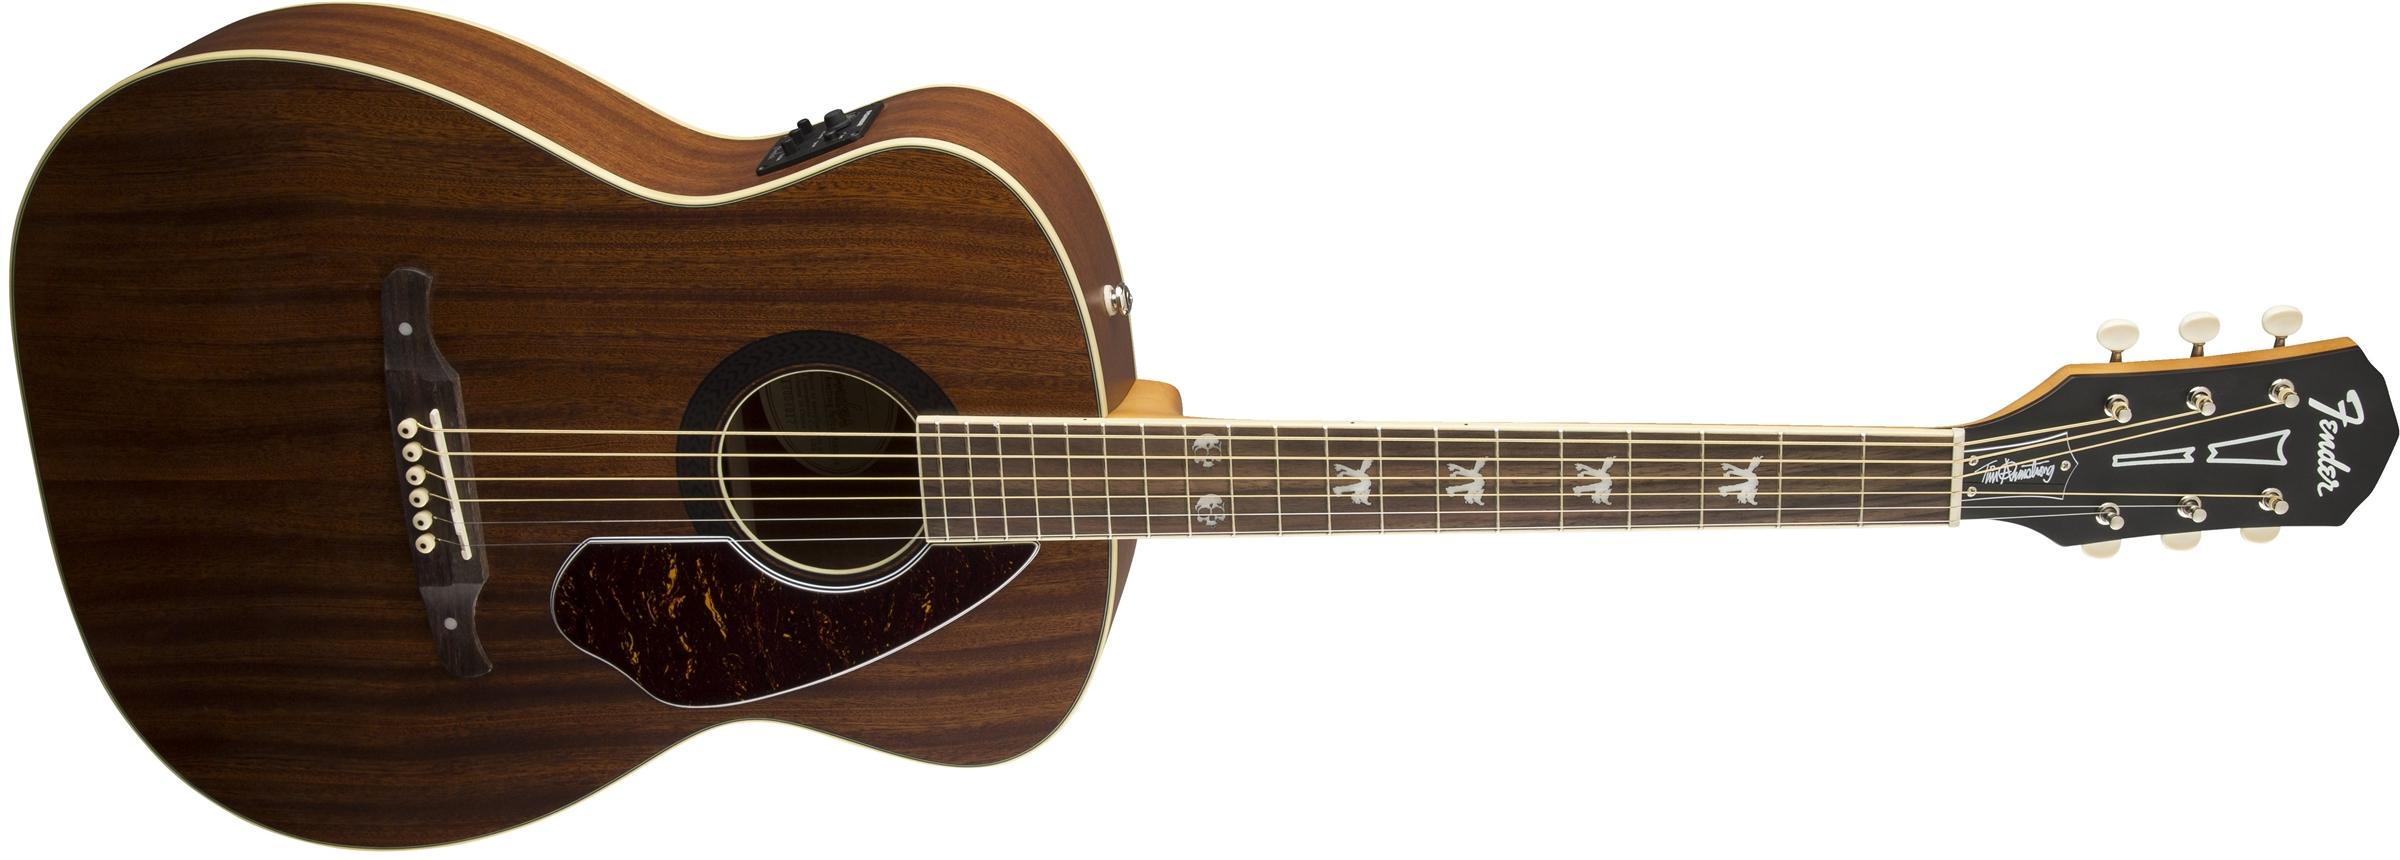 tim armstrong hellcat fender acoustic guitars. Black Bedroom Furniture Sets. Home Design Ideas